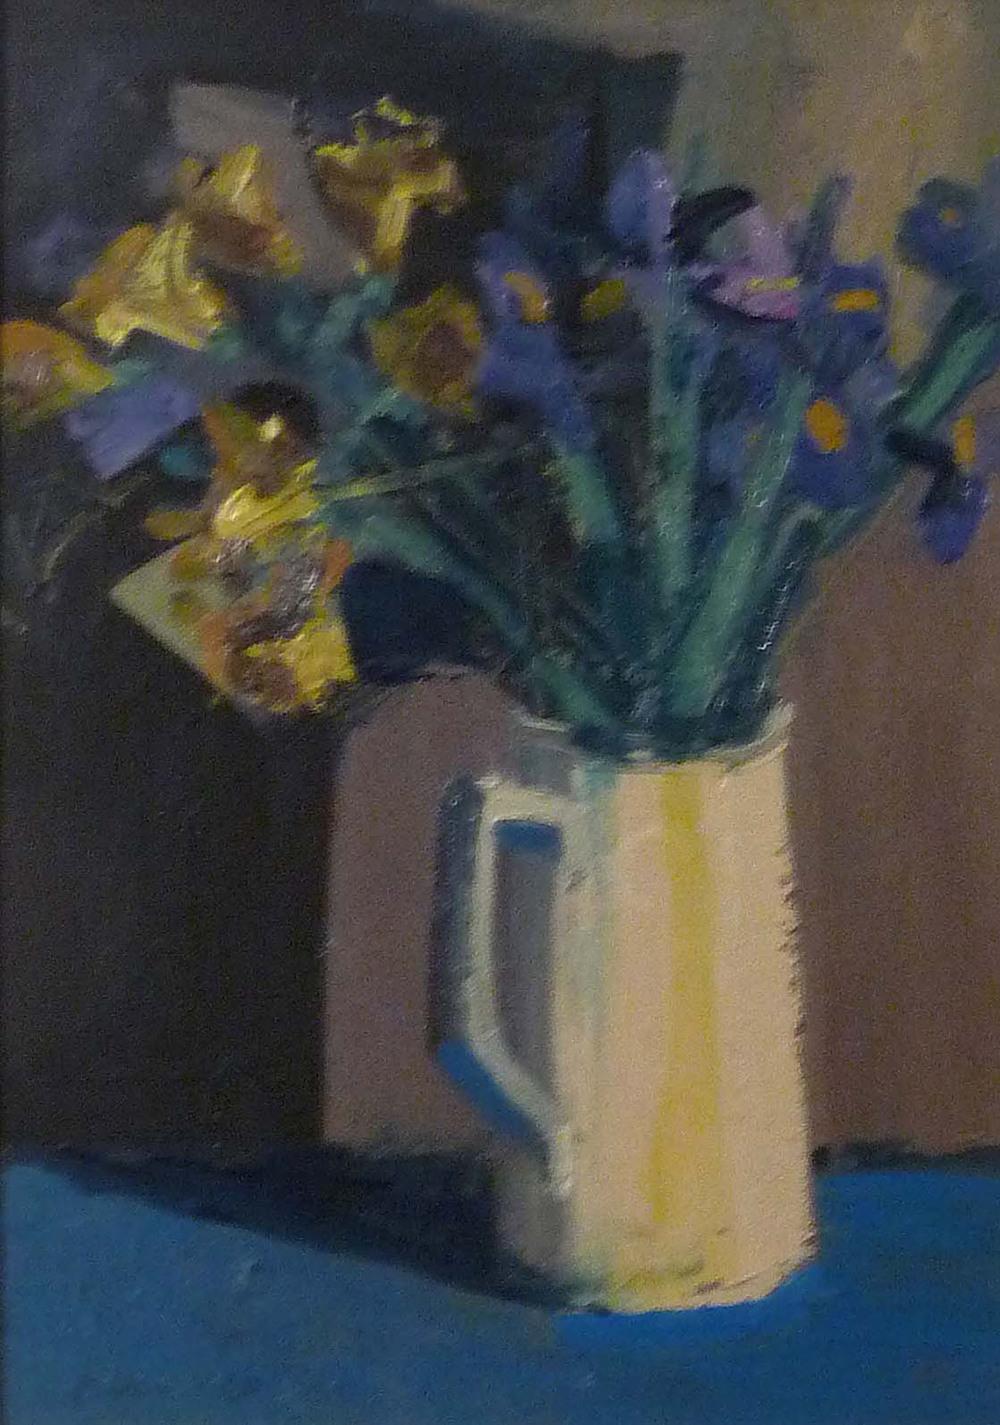 Brian Ballard_-_Yellow Jug_36 x 26cm.jpg